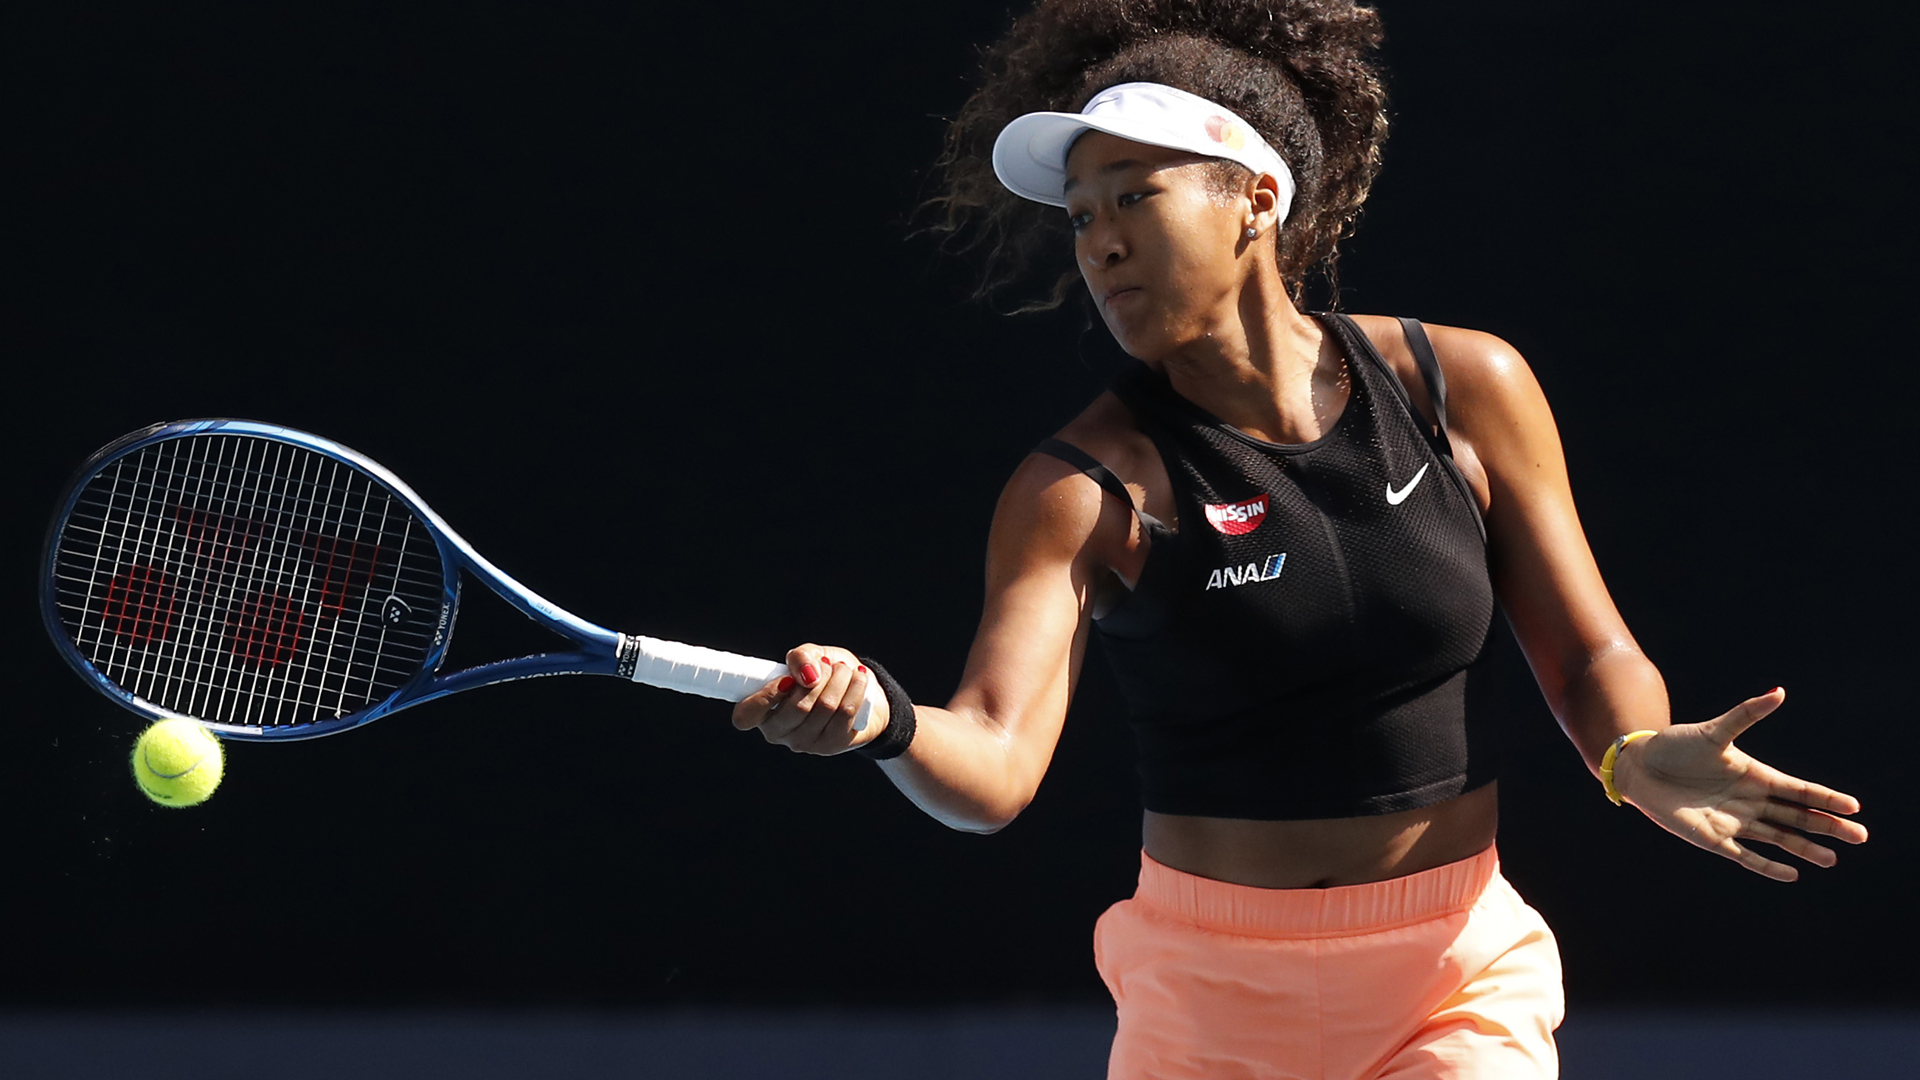 Australian Open 2020: I was more fearless last year – Osaka